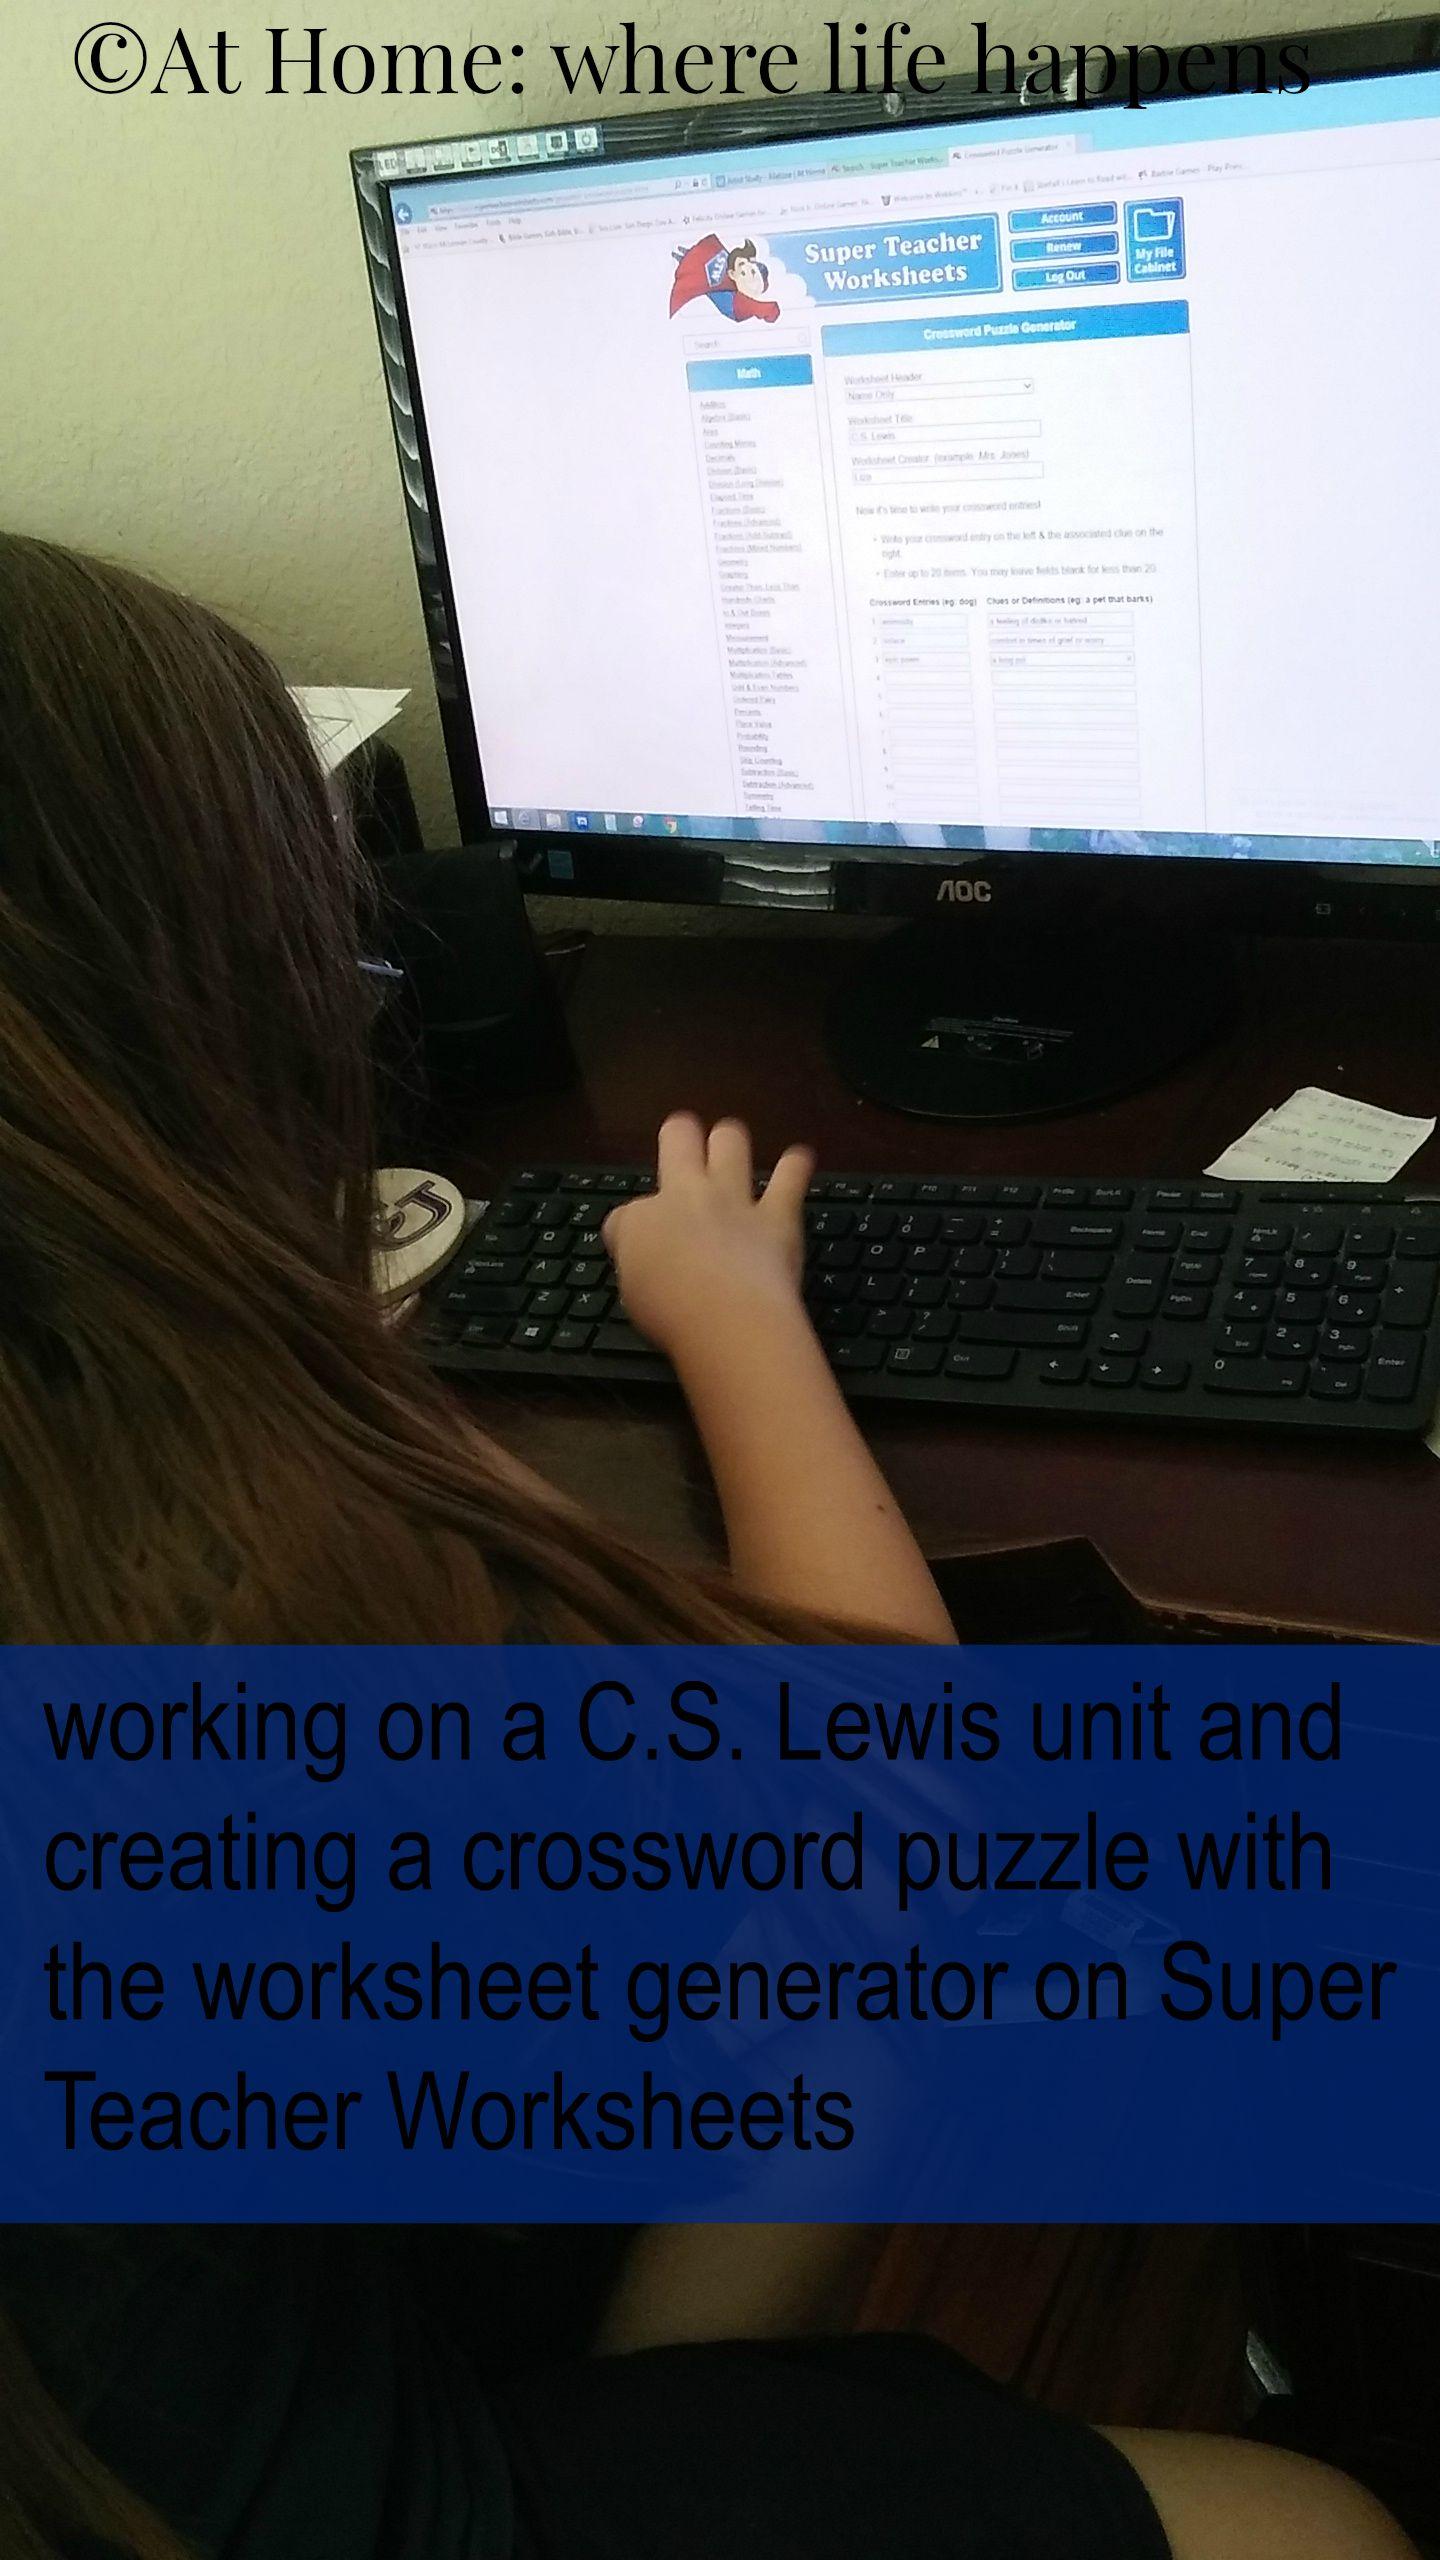 Free Worksheet Computer Technology Worksheets super teacher worksheets a tos review at home worksheet generator